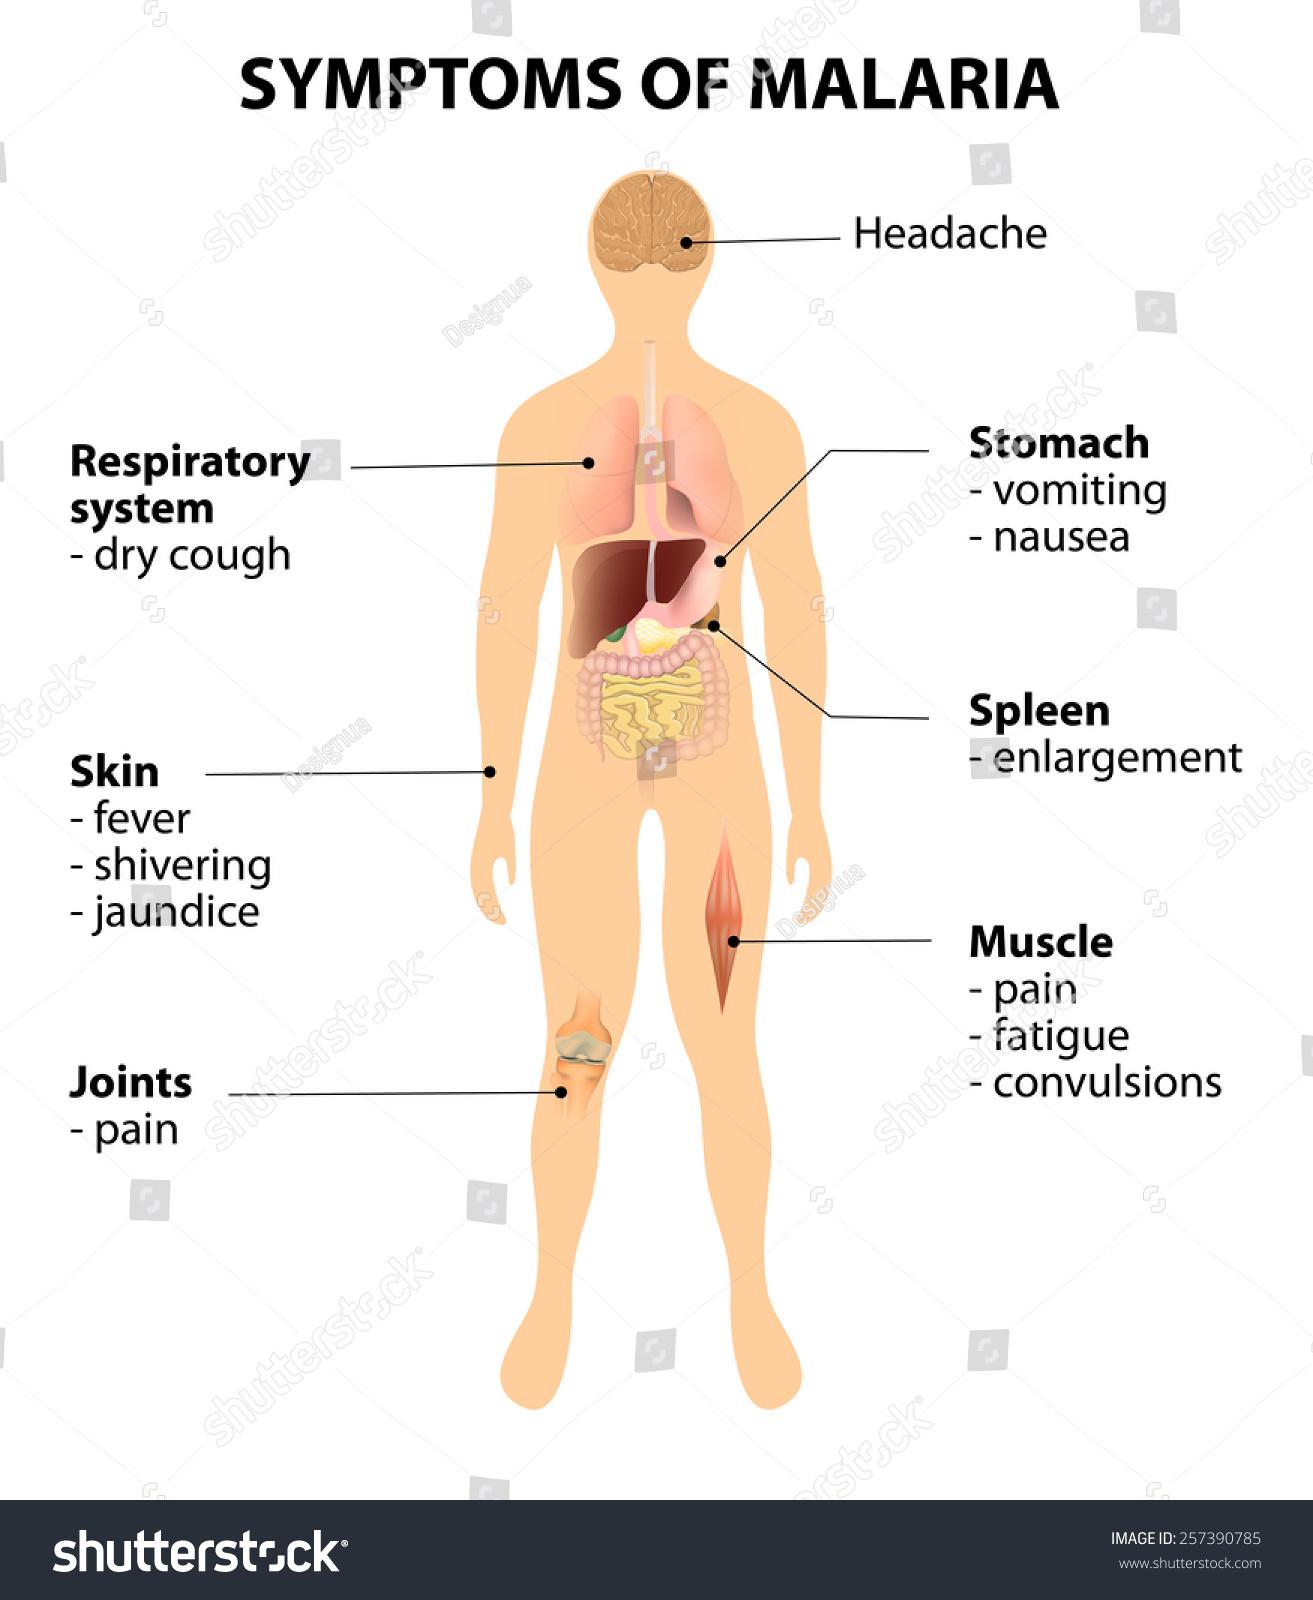 How to Recognize Malaria Symptoms